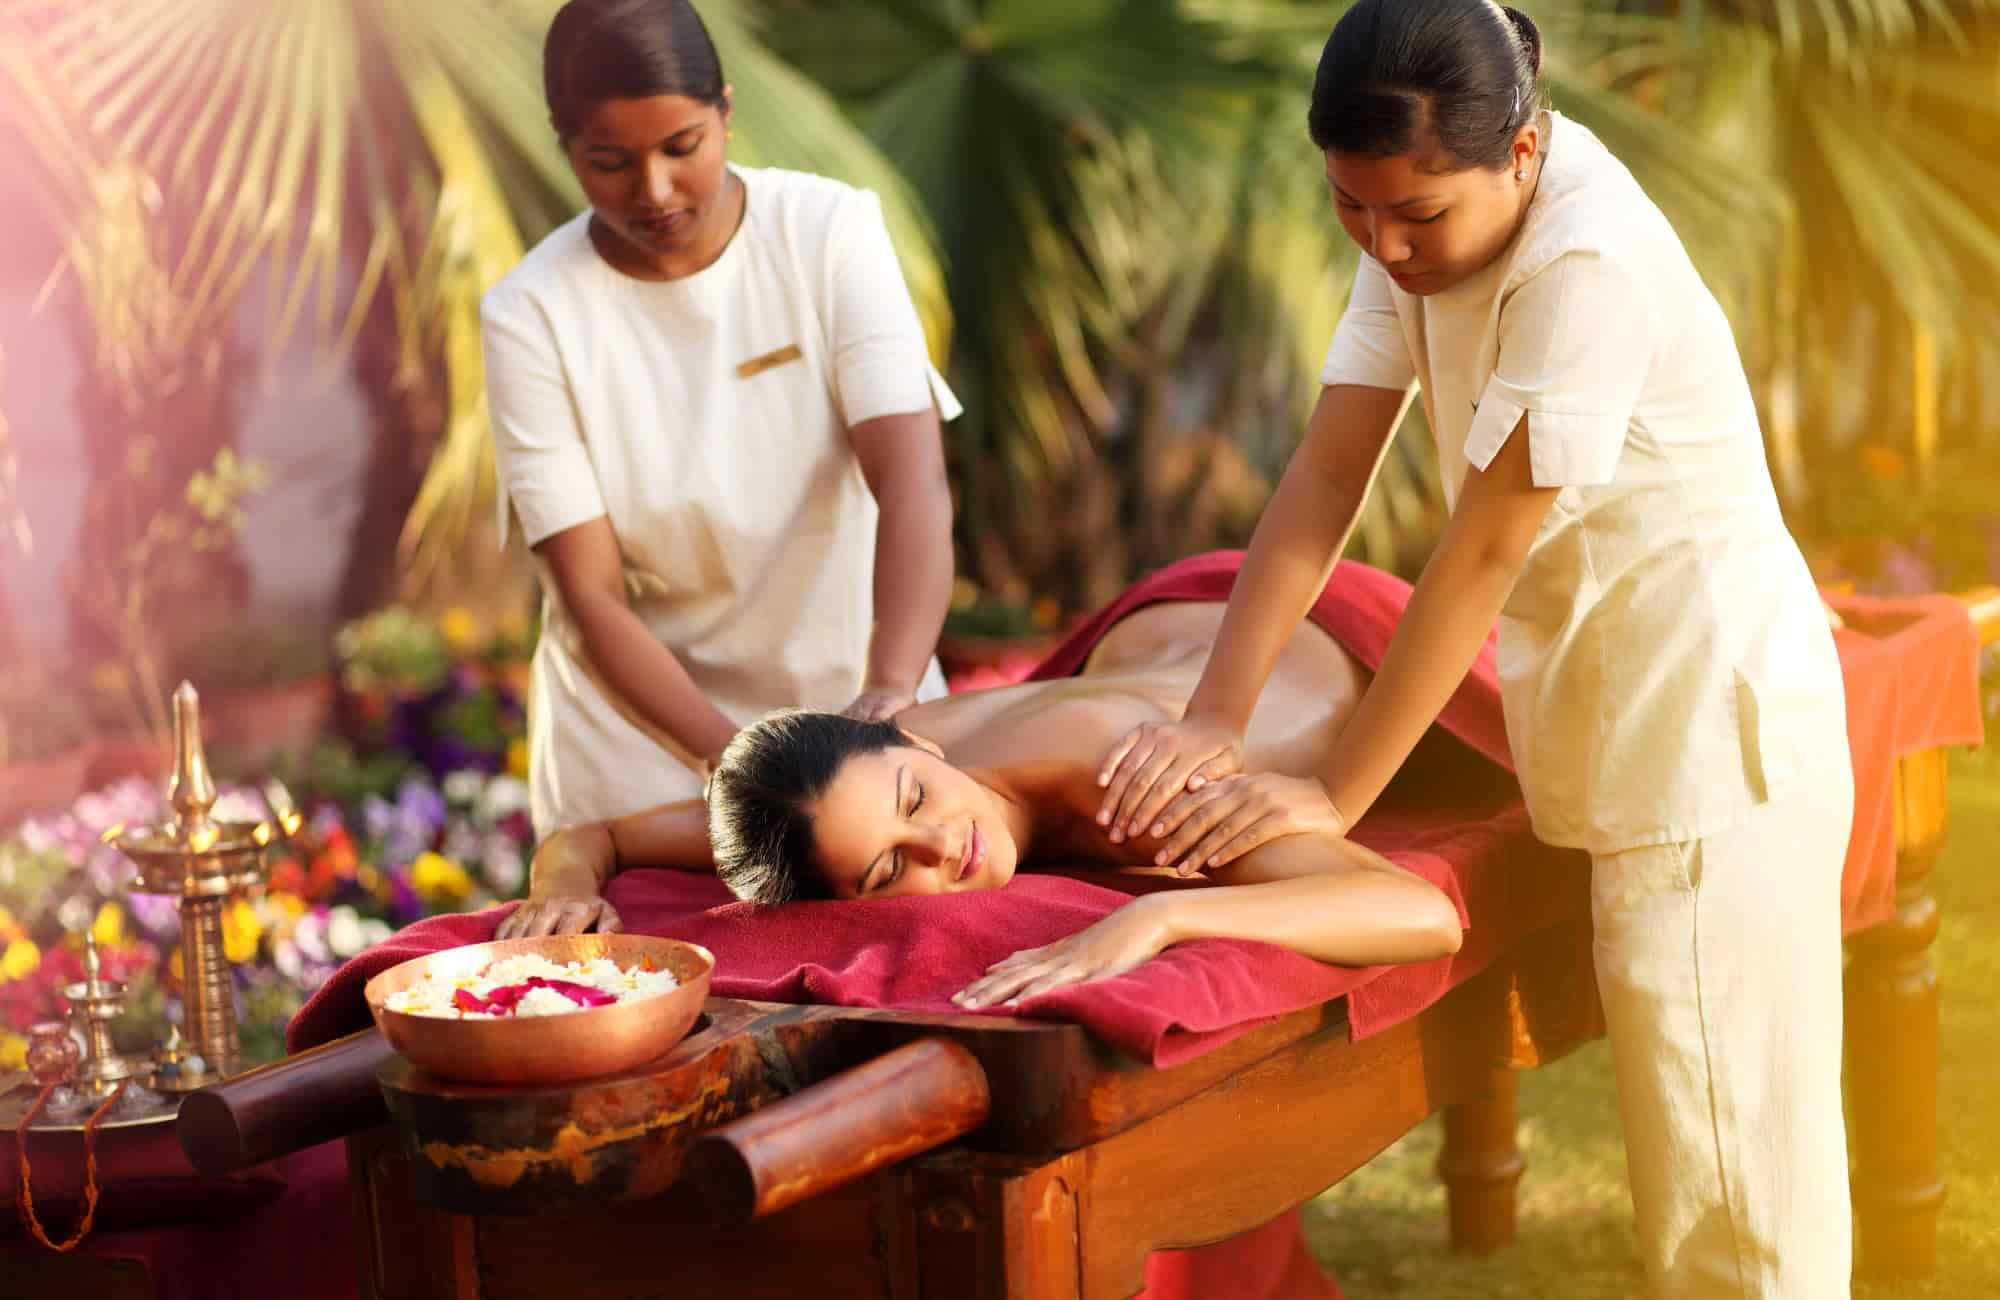 Voyage Inde - Cure Ayurvédique Massage - Amplitudes